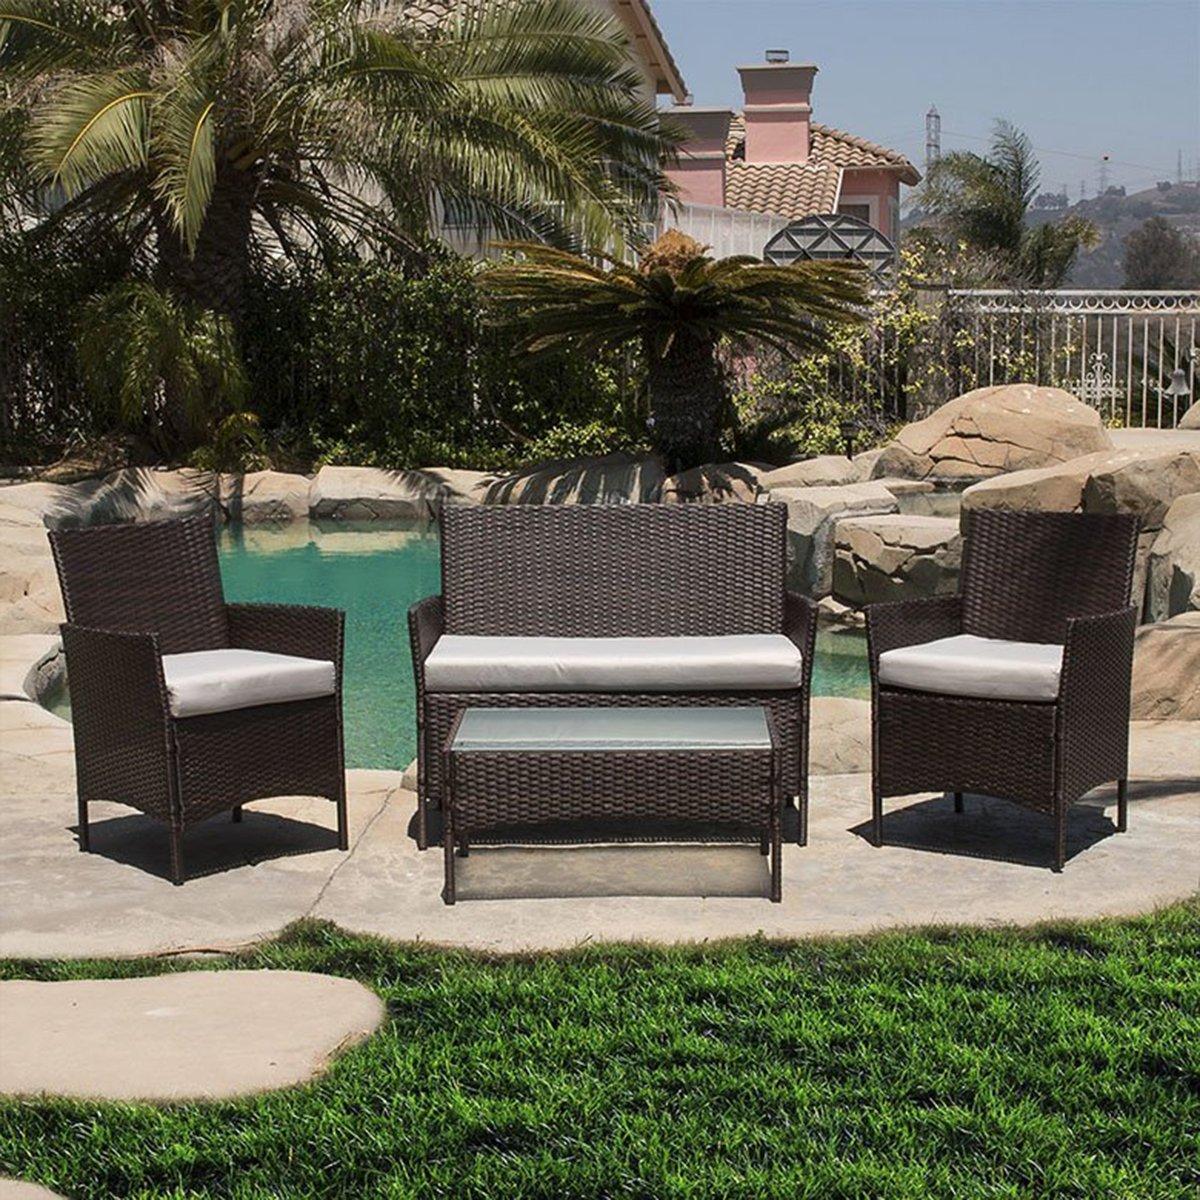 cheap allen roth wicker patio furniture